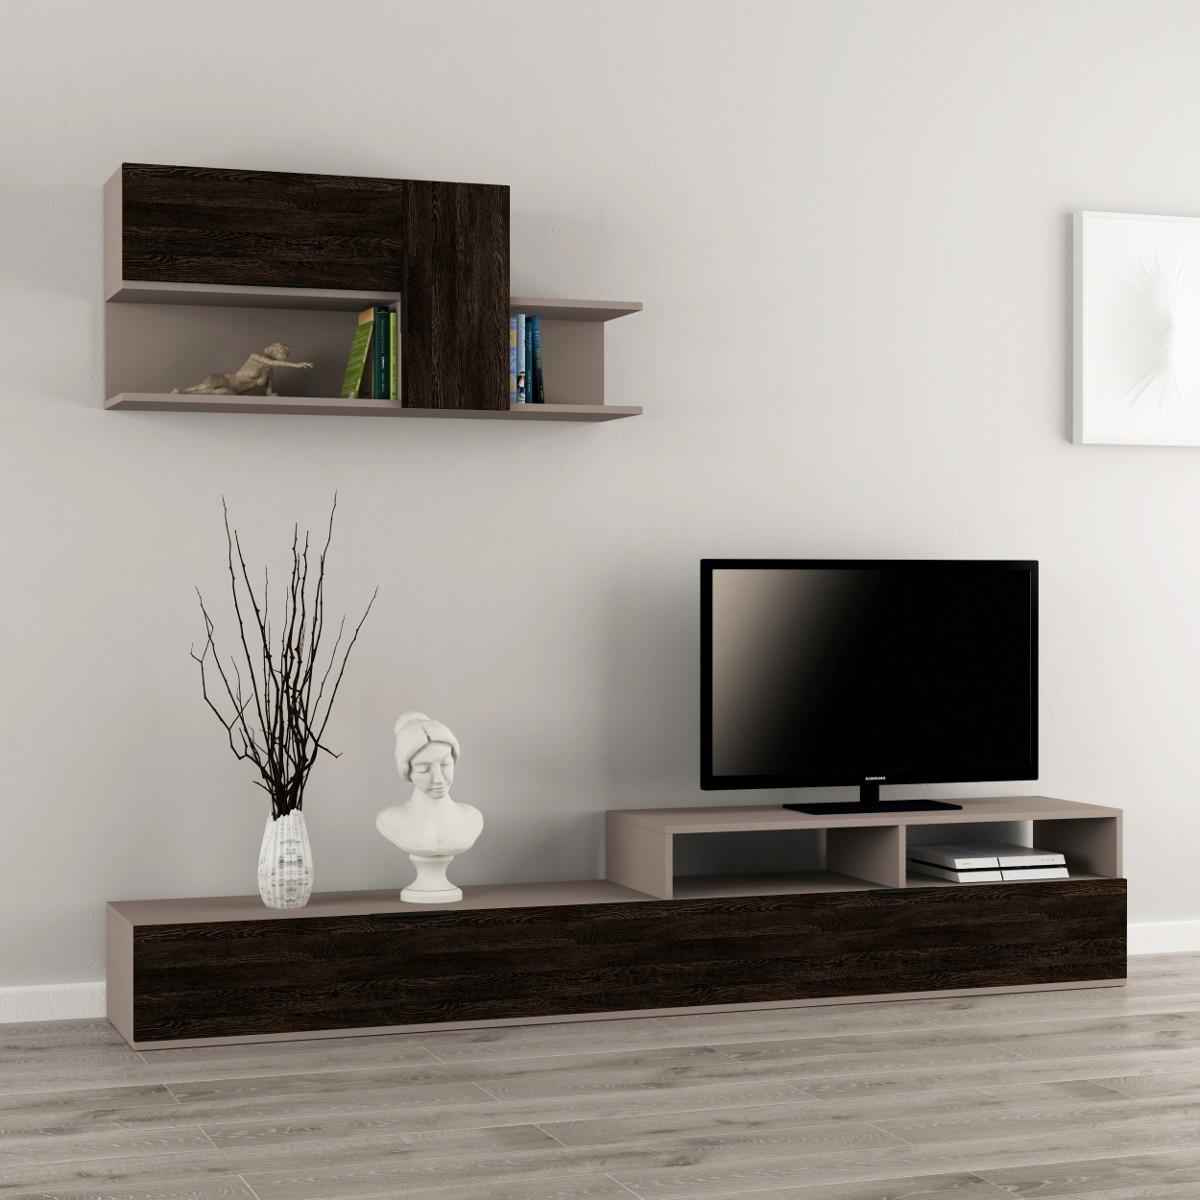 Adair parete attrezzata in legno melaminico design moderno - Parete attrezzata design ...